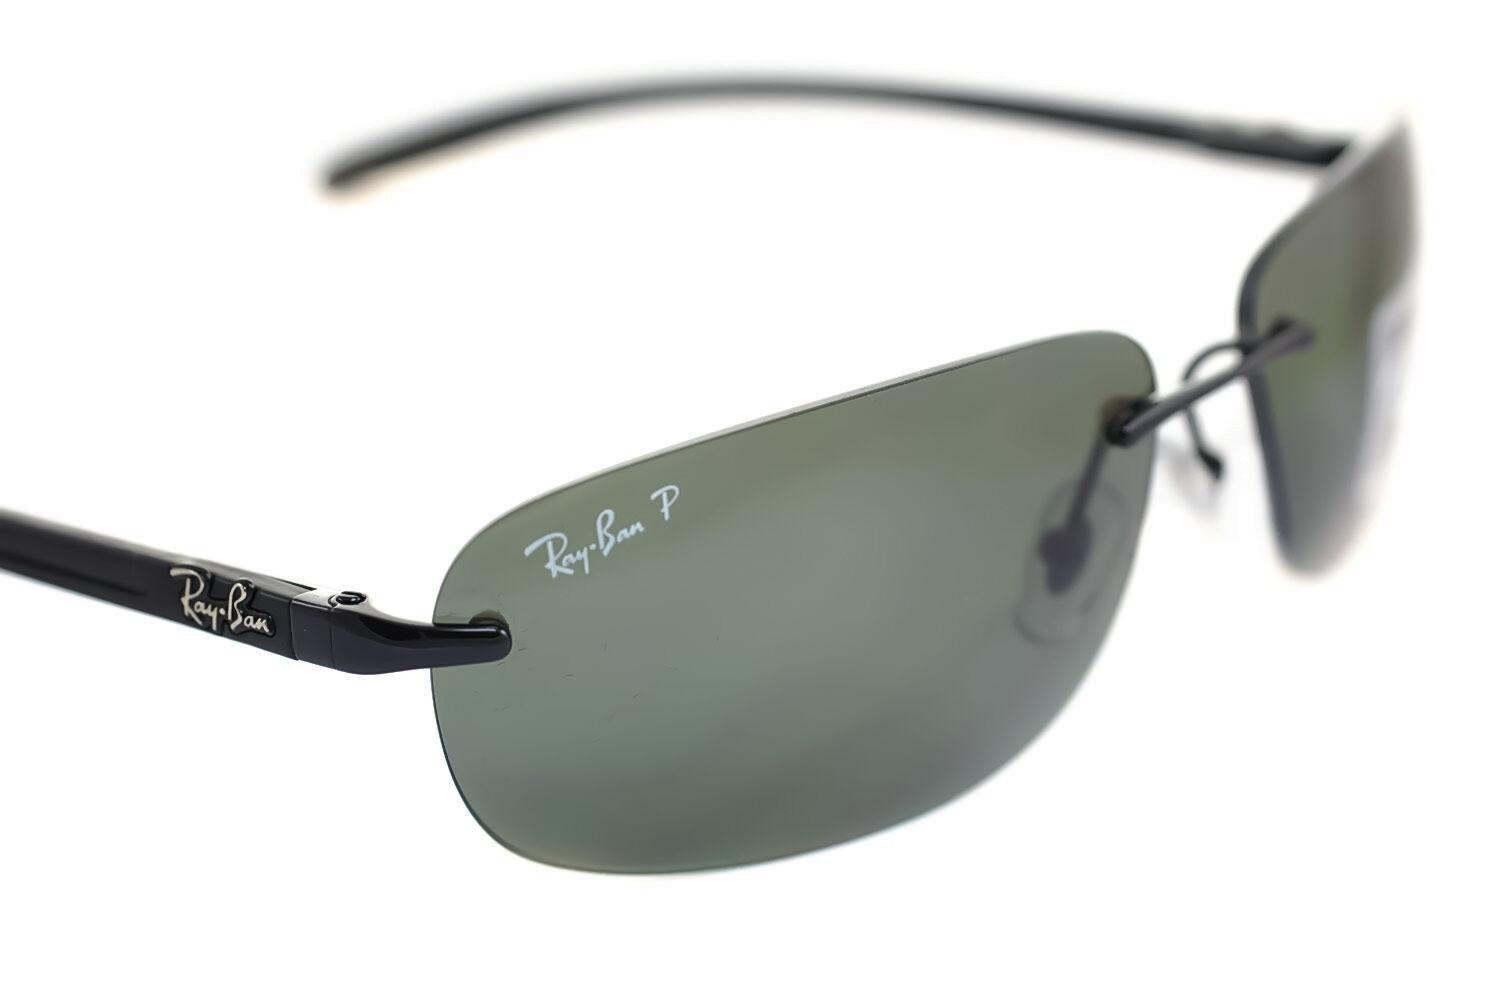 44dbaee35 ... sale ray ban tech carbon fibre polarized sunglasses 71cea 59e7a